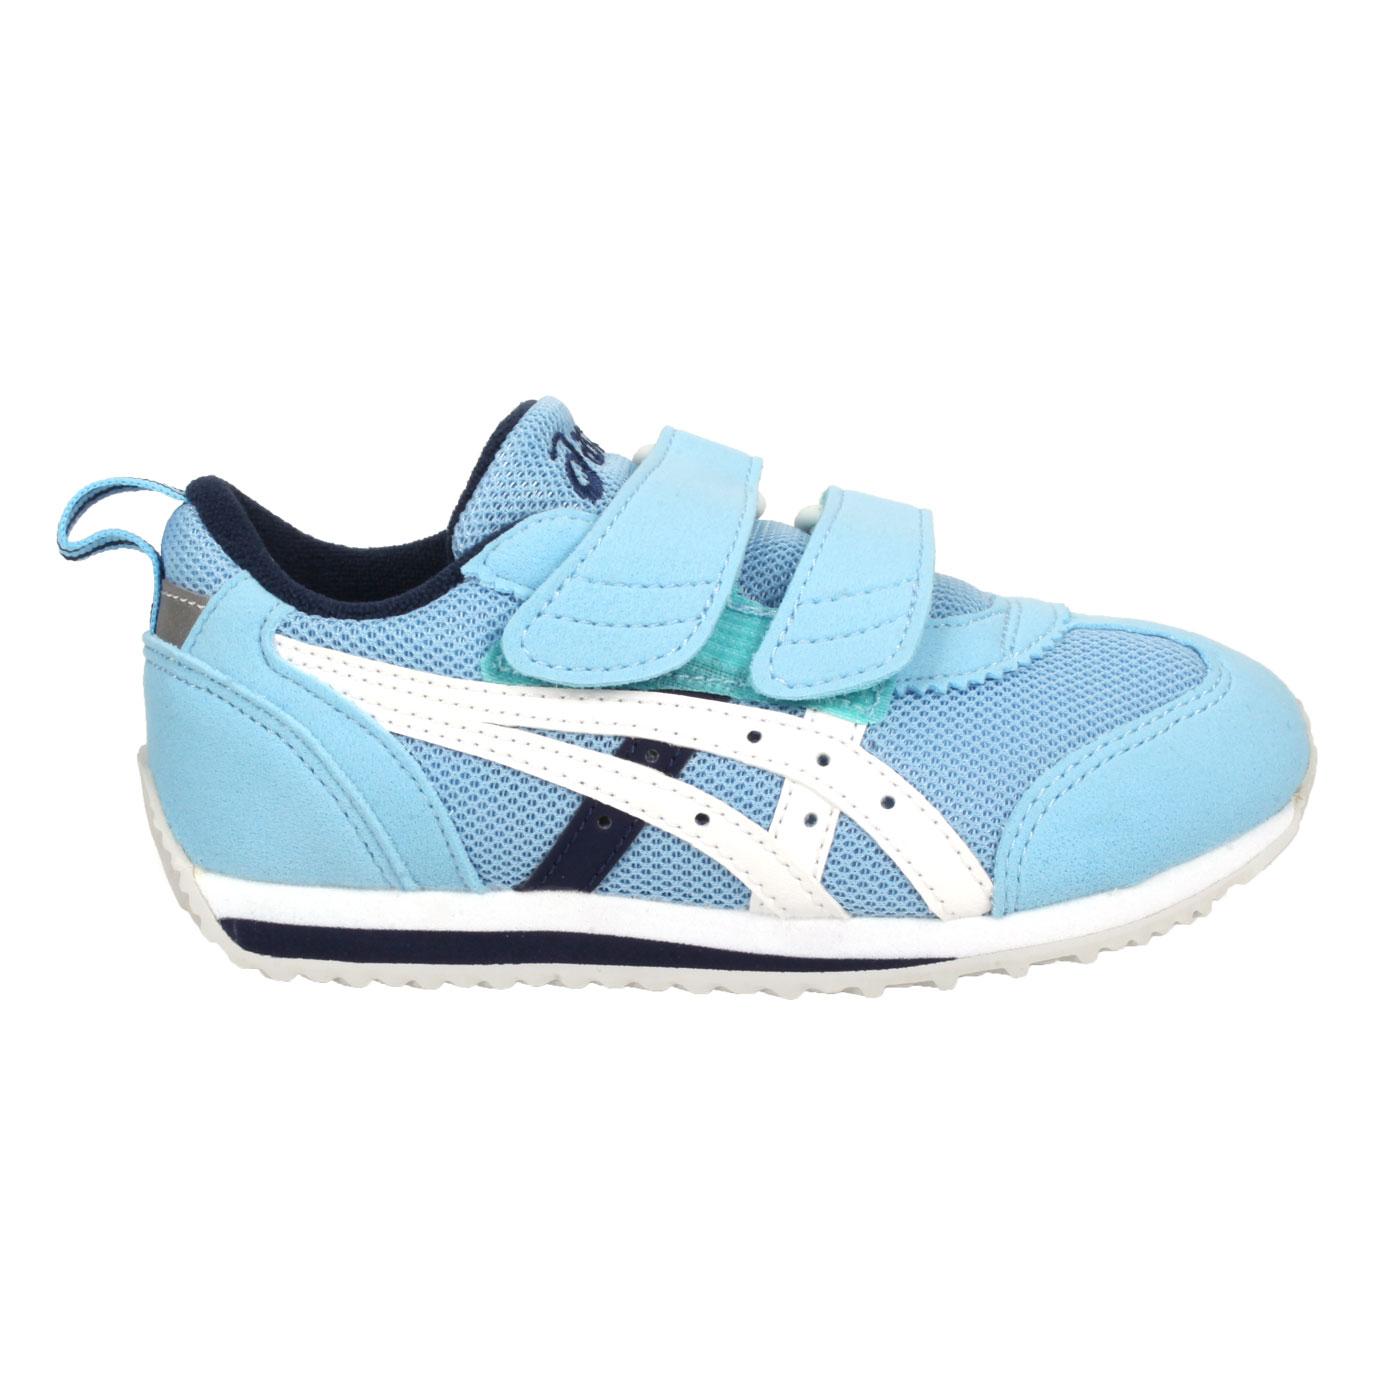 ASICS 中童運動鞋  @IDAHO MINI 3@TUM186-402 - 水藍白丈青